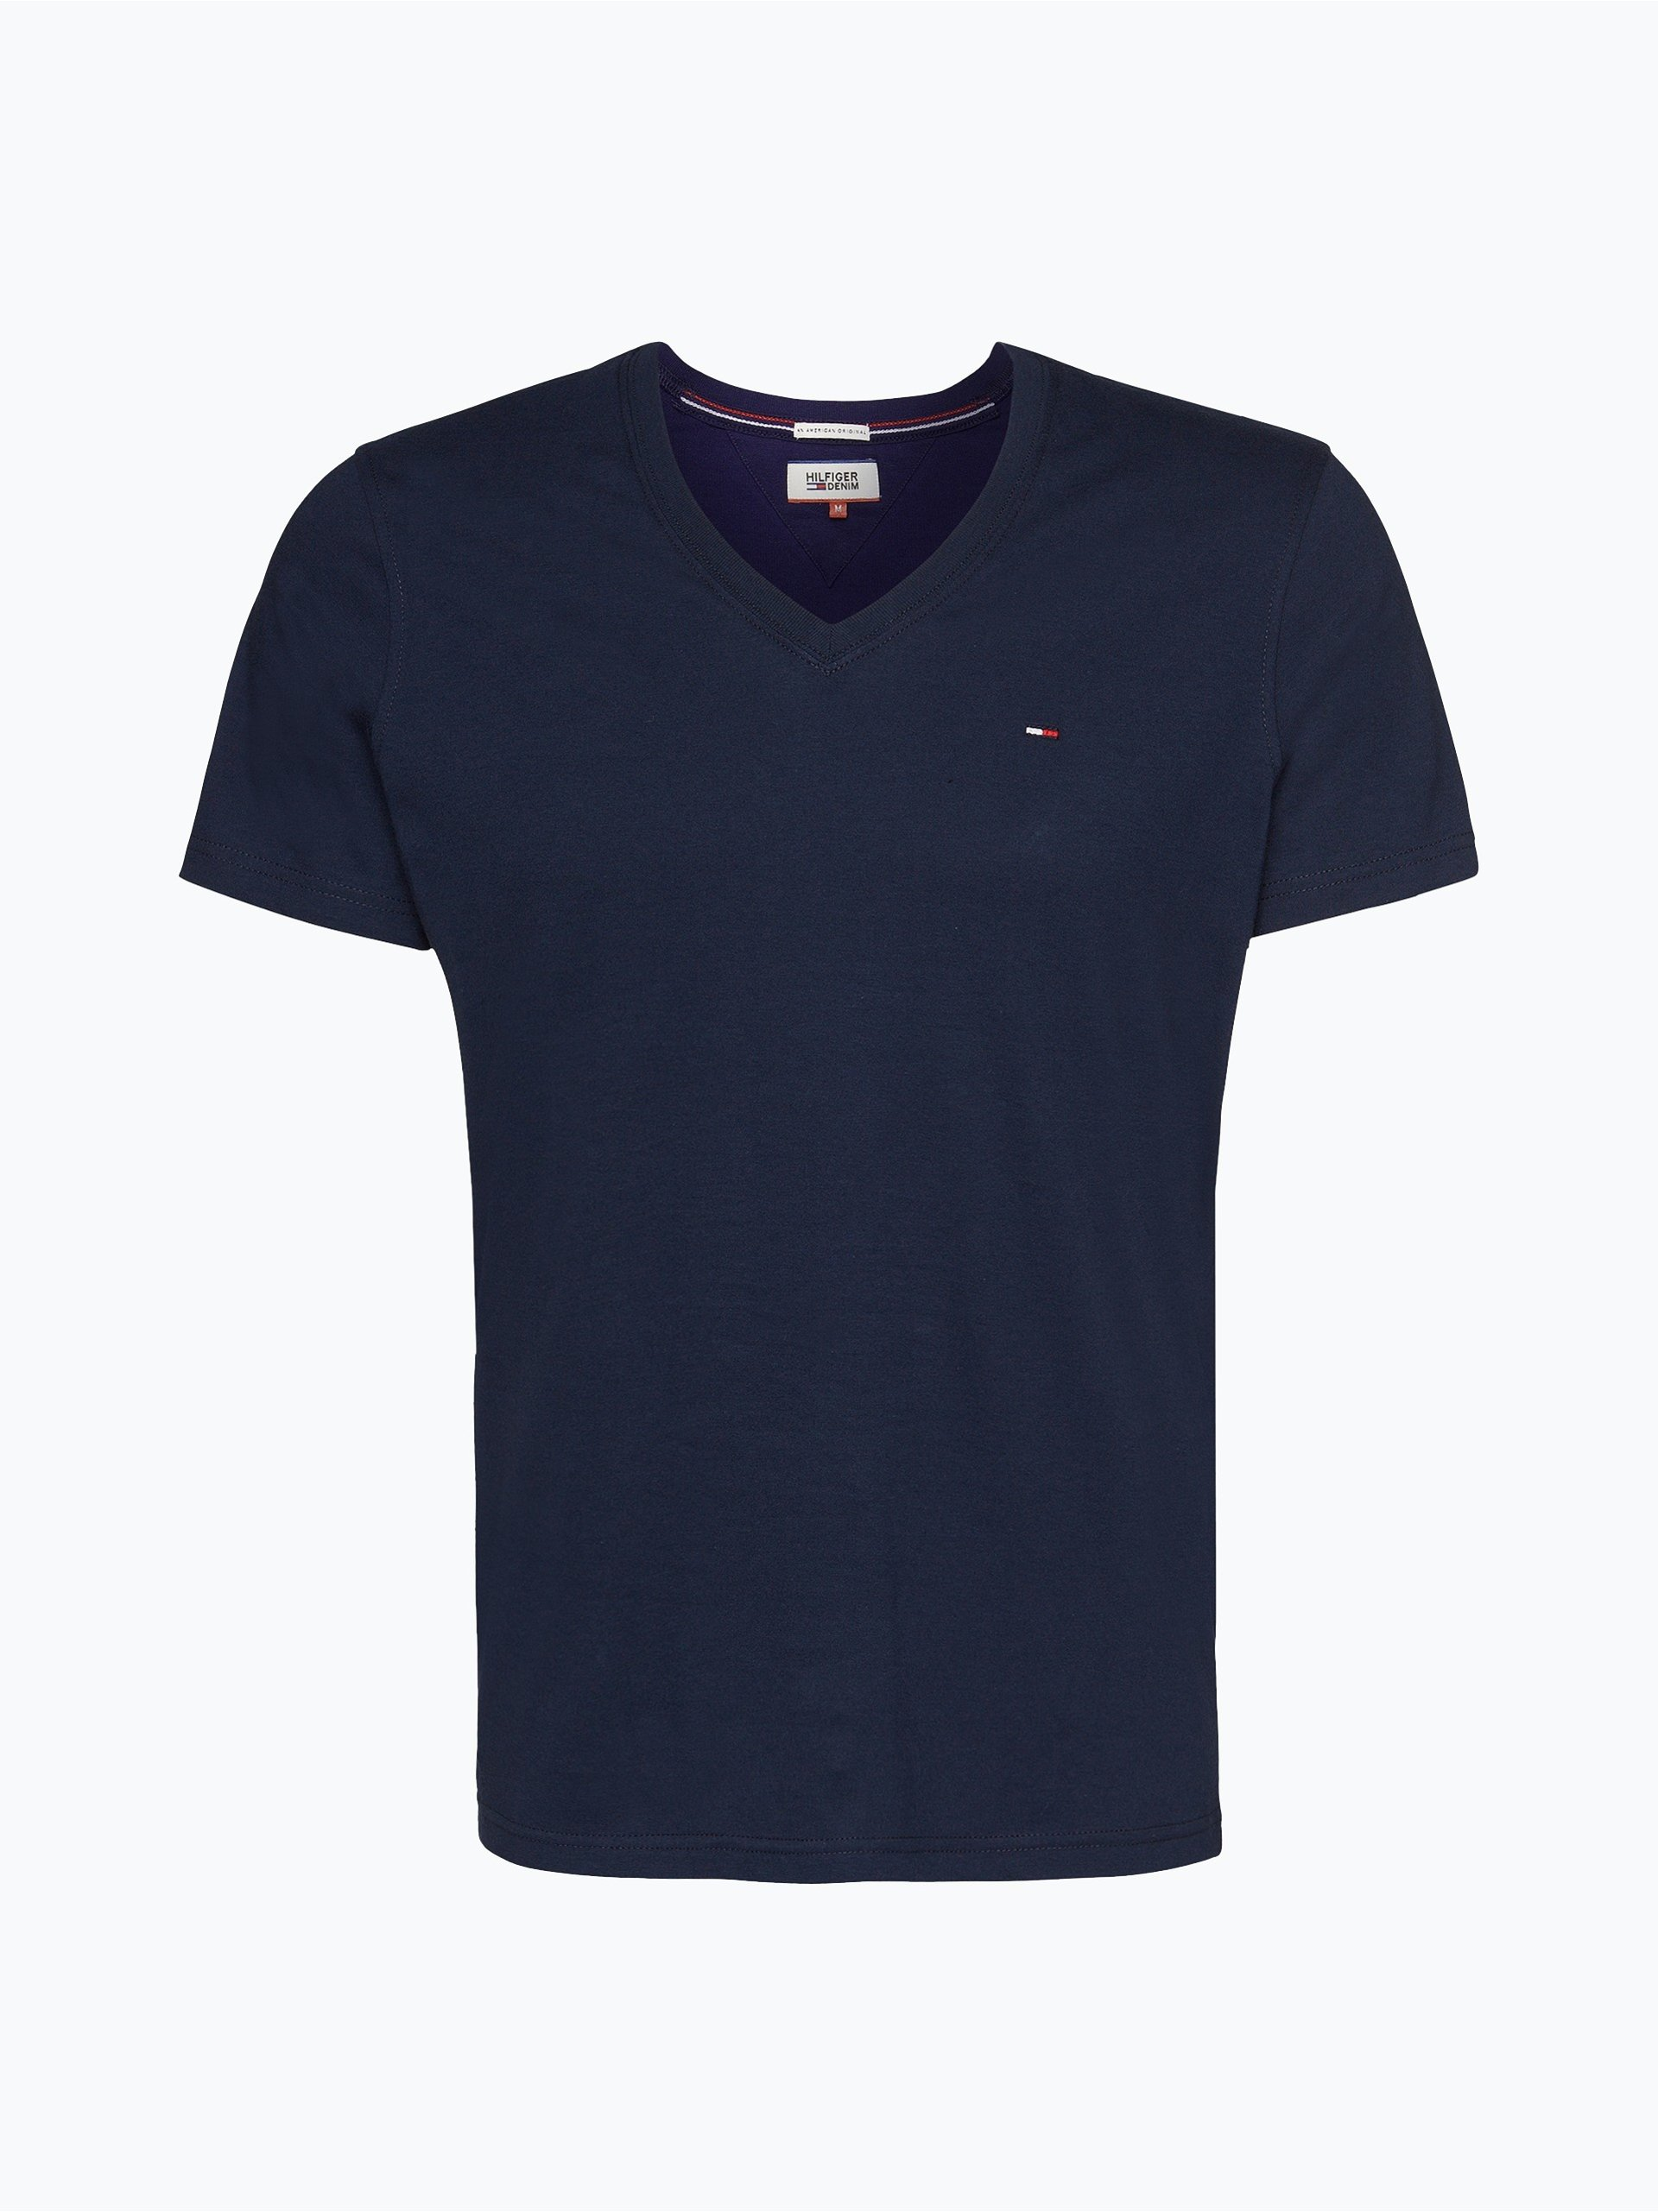 Tommy Jeans Herren T-Shirt - Original